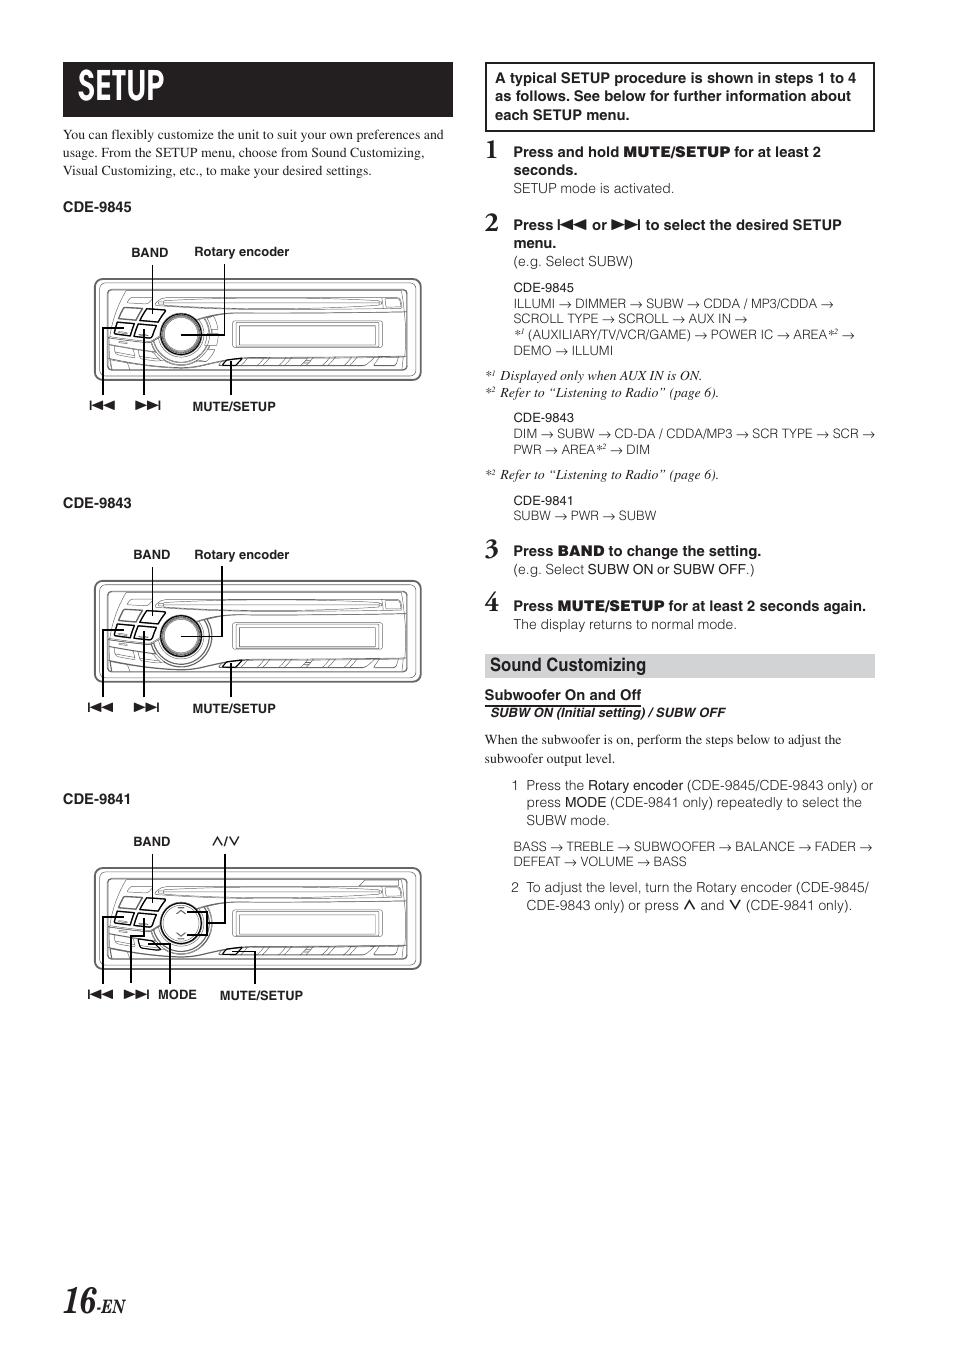 setup sound customizing alpine cde 9843 user manual page 17 rh manualsdir com alpine cde 9843r manual pdf Alpine CDE 9843 Specs